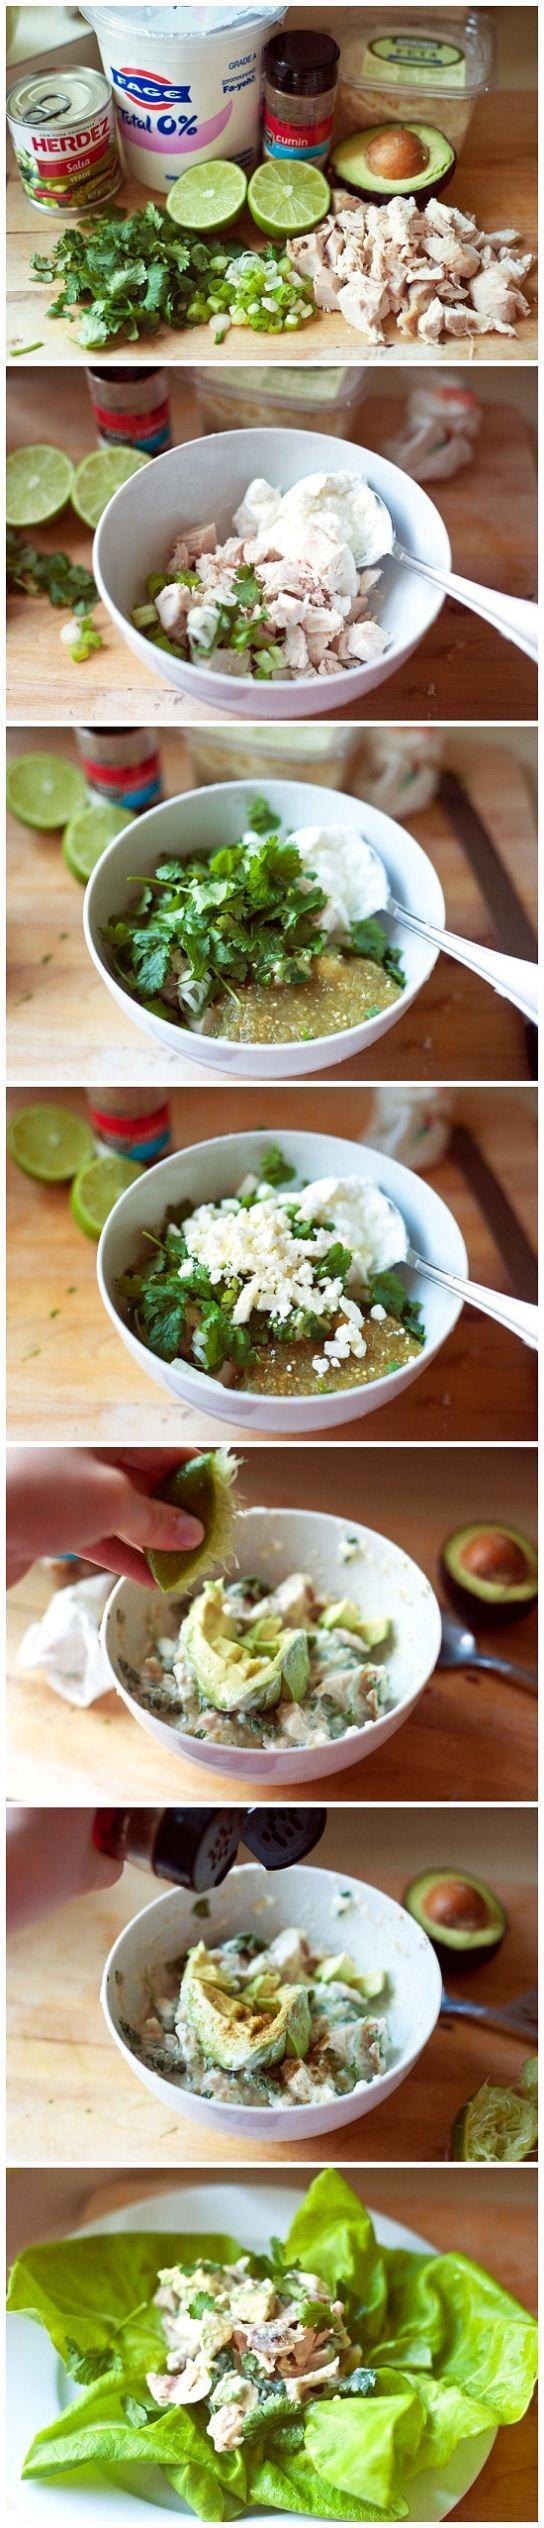 cabbage scrambled egg wrap avocado feta and cabbage wrap recipes